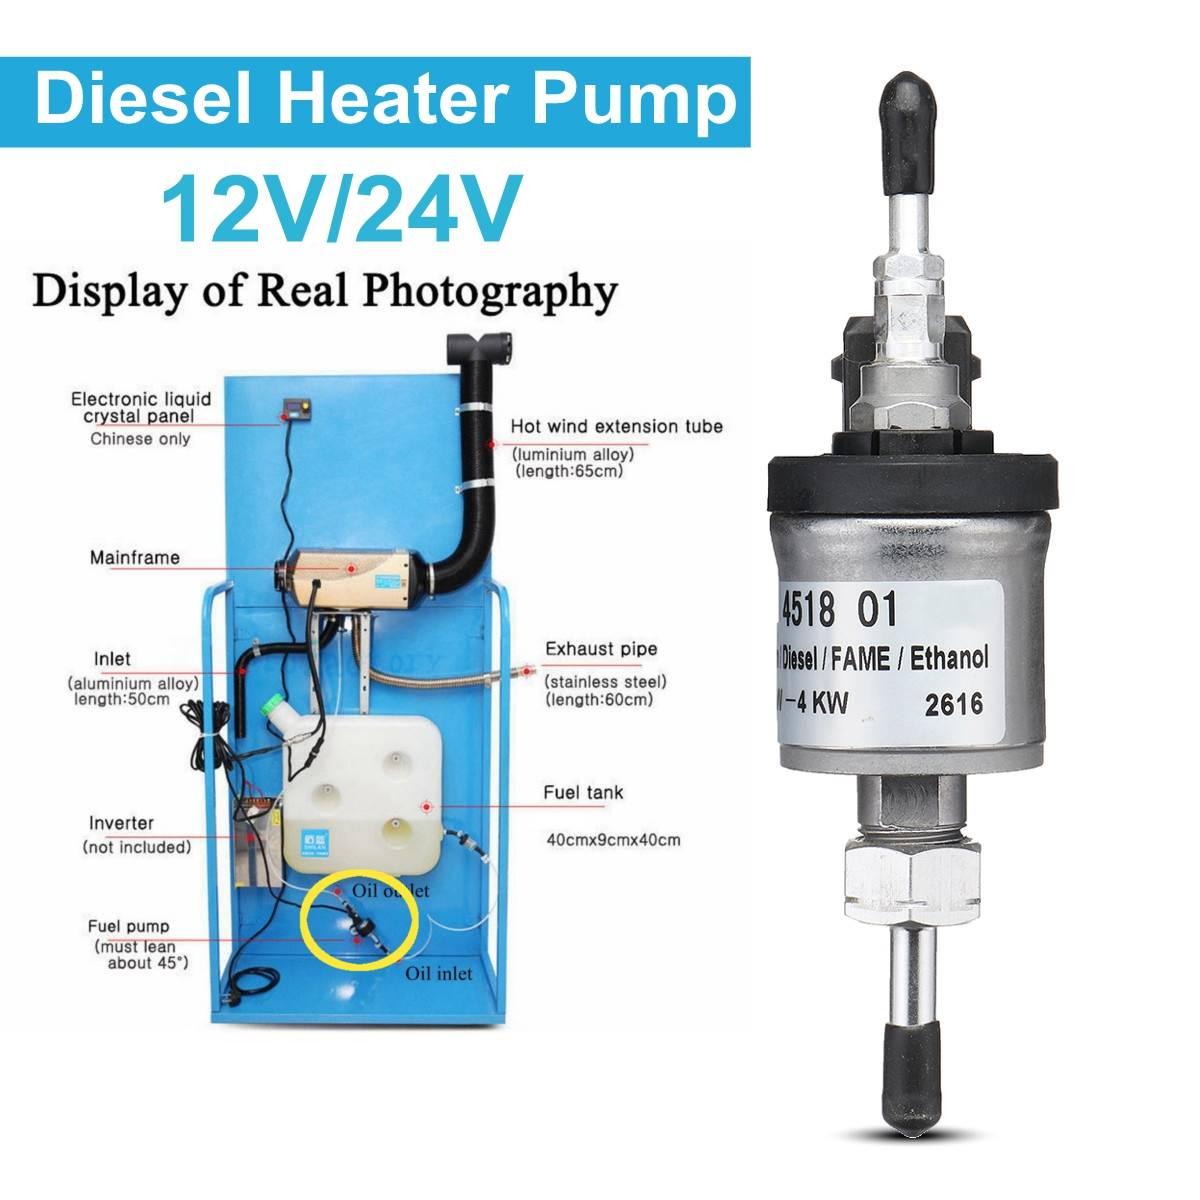 Universal 12V//24V Electric Heater Parking Heater Pulse Metering Oil Fuel Pump for Webasto for Eberspacher Heater 2-5KW etc.